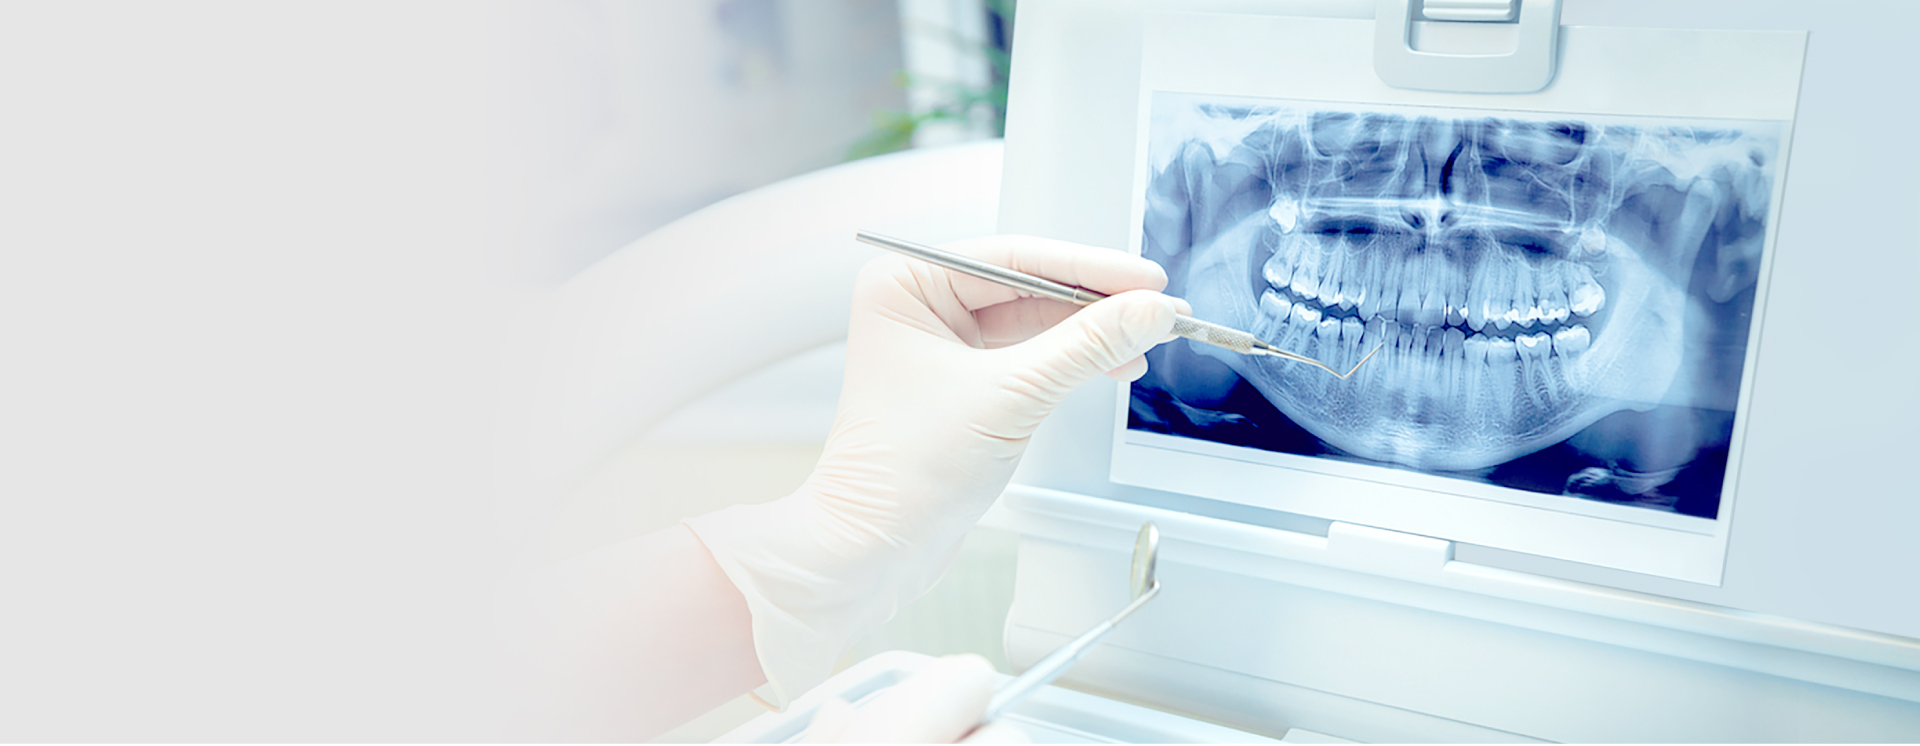 Giá cắm implant tại Nha Khoa KIM bao nhiêu tiền?